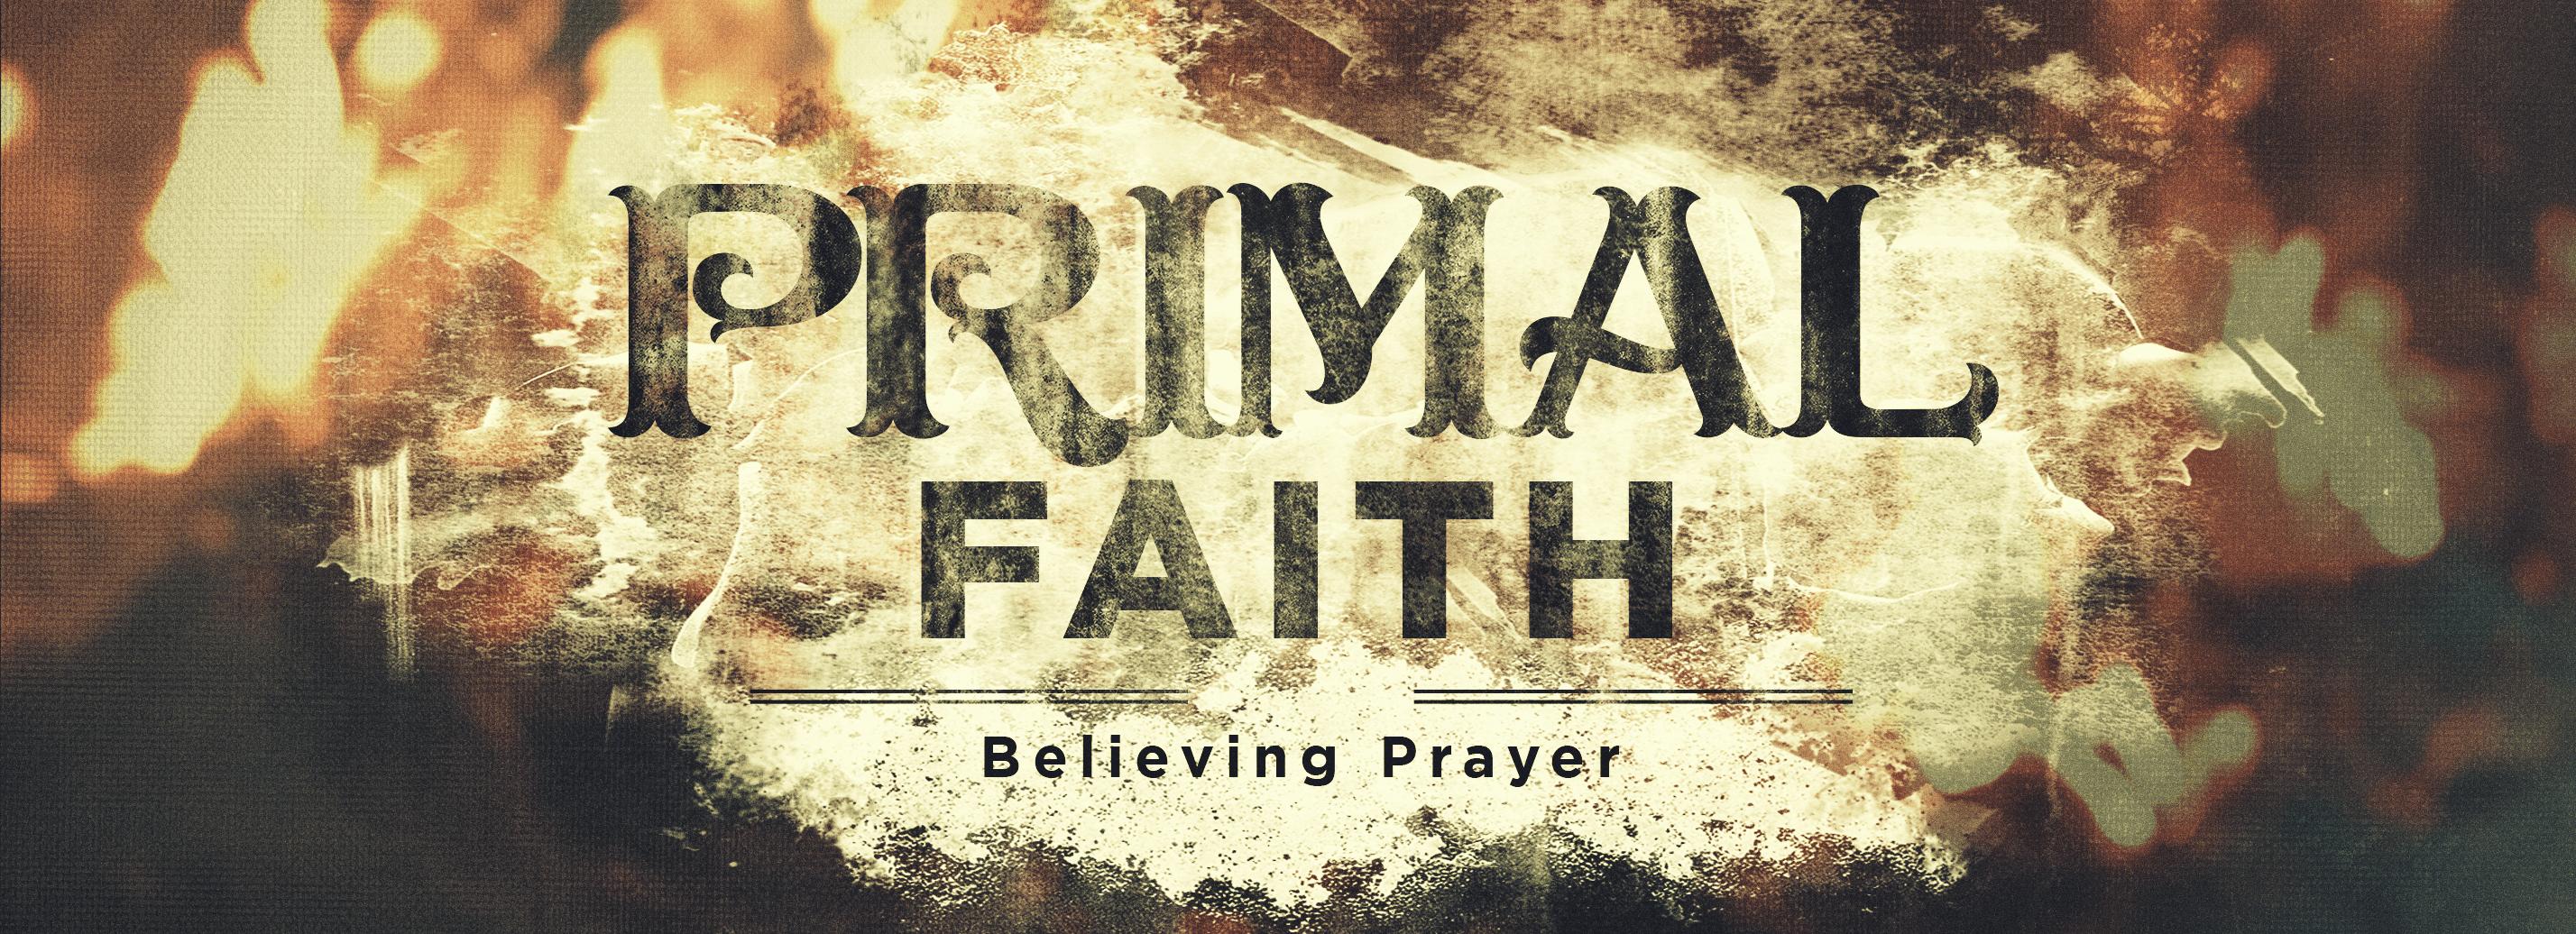 Bridge-PrimalFaith-believingprayer